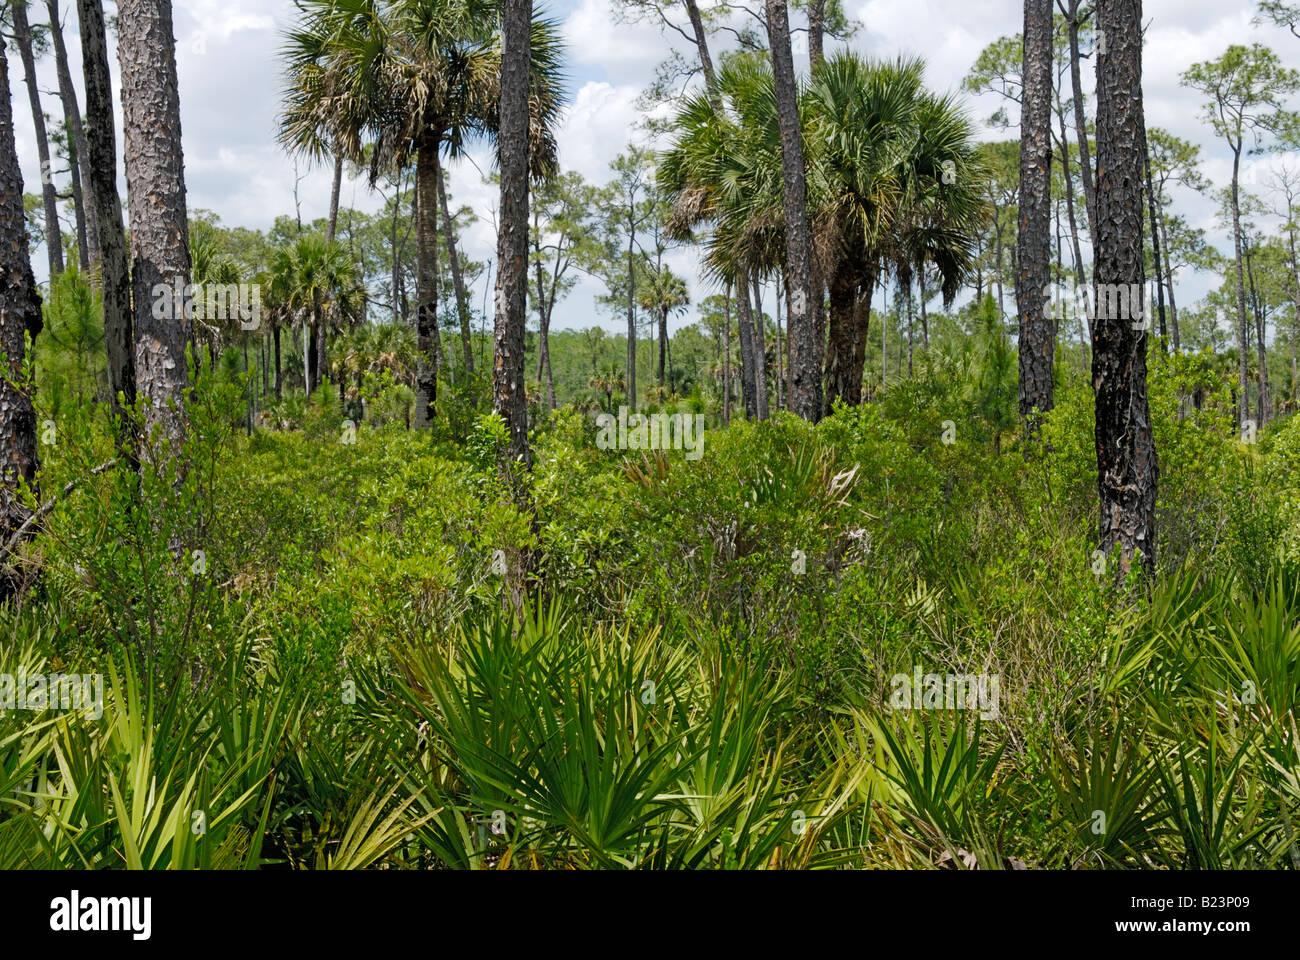 Pine flatwood ecosystem in southern Florida Corkscrew Swamp Audubon Sanctuary - Stock Image